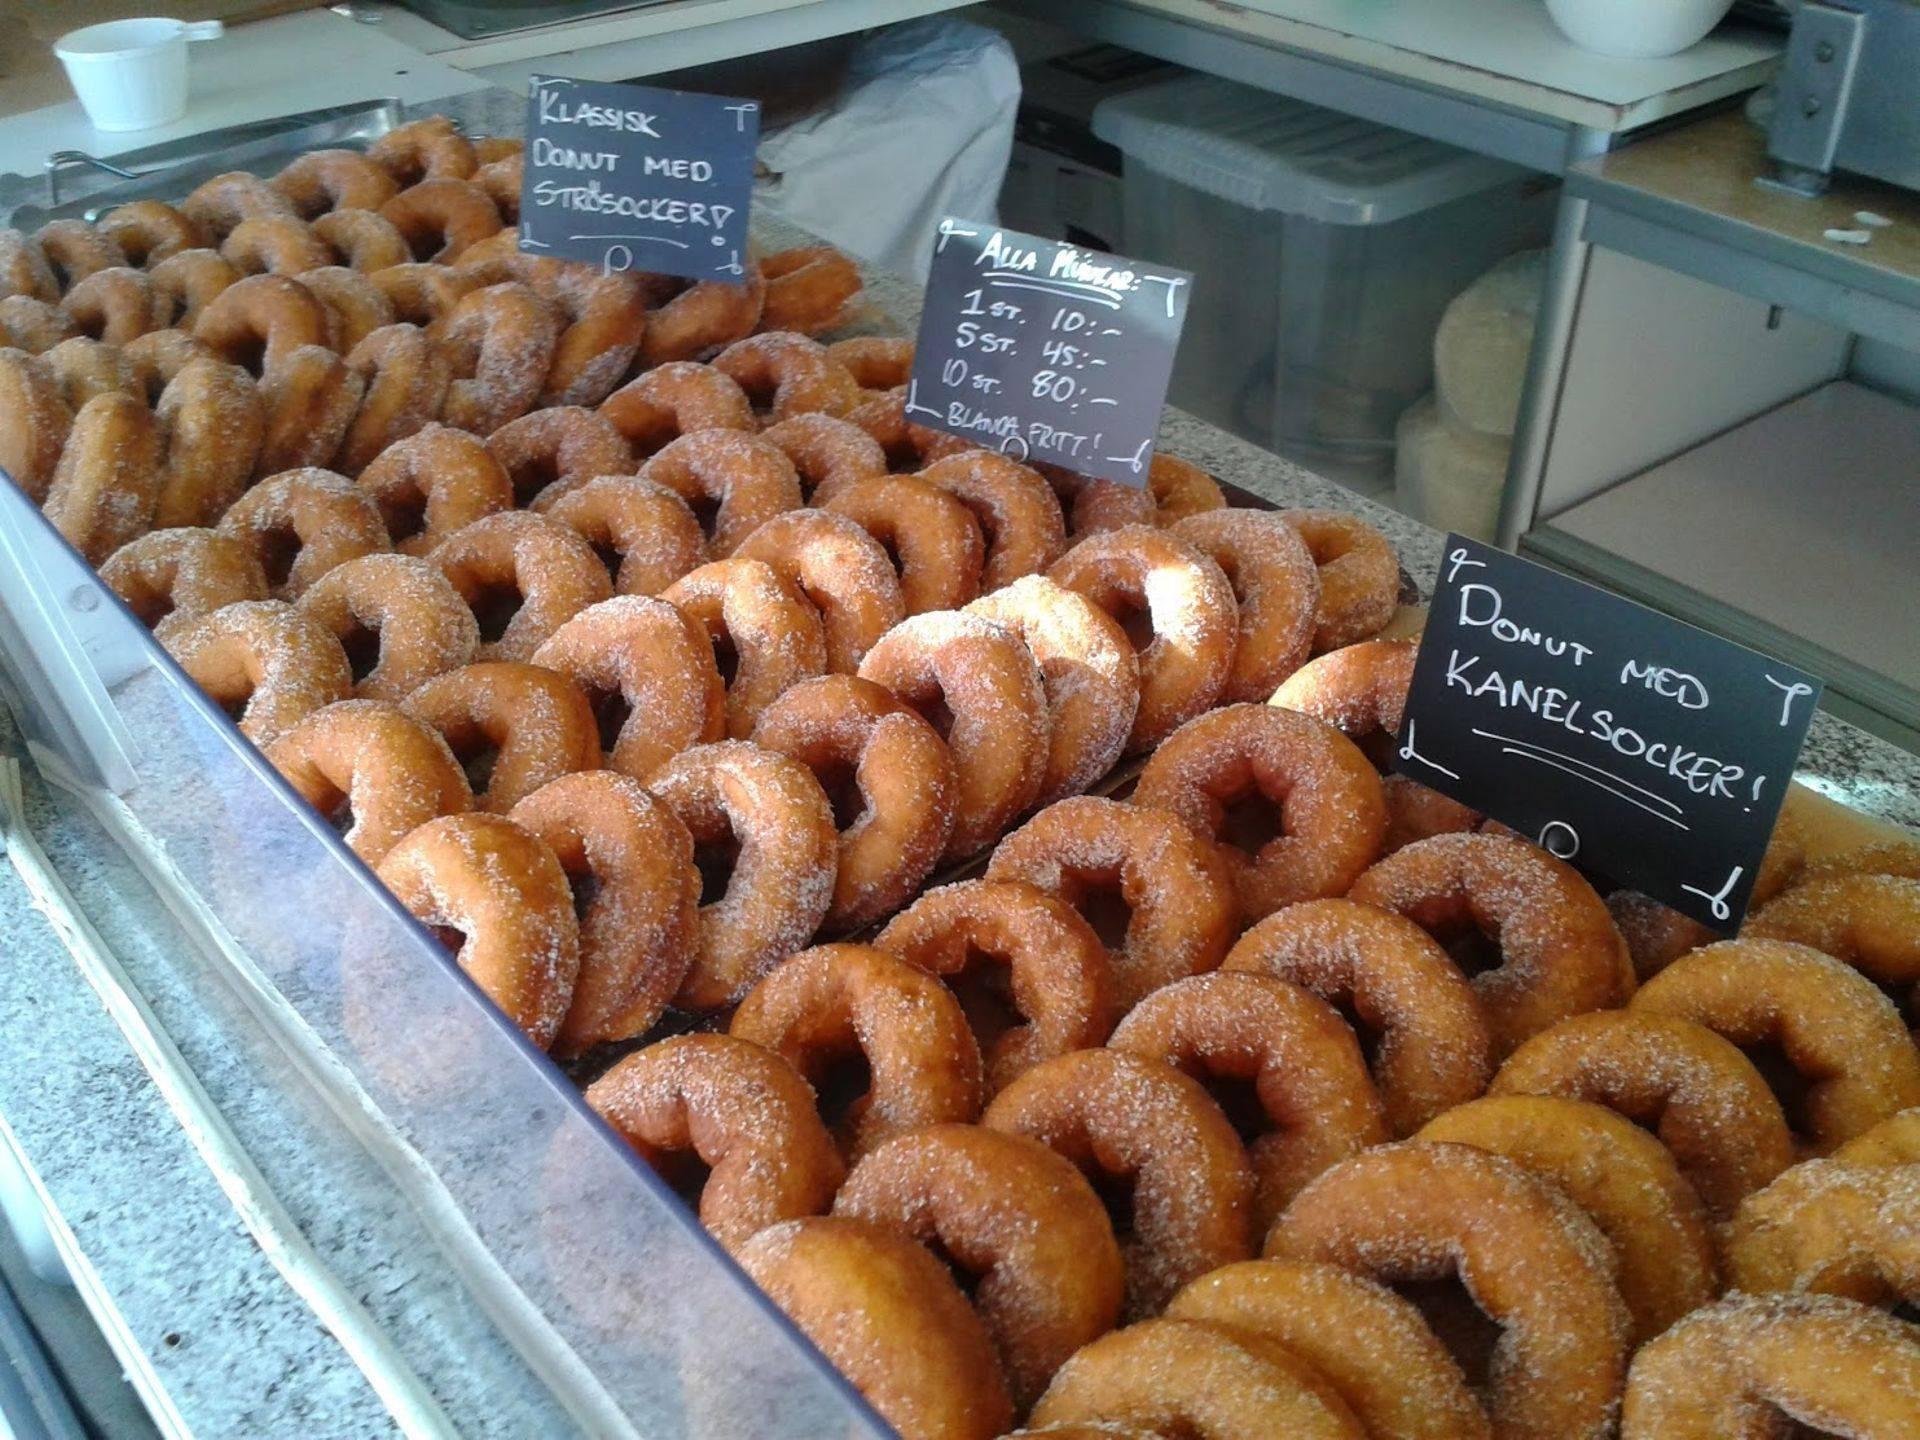 Munkar-sockermunk-donuts-nybakade-munkmaskin